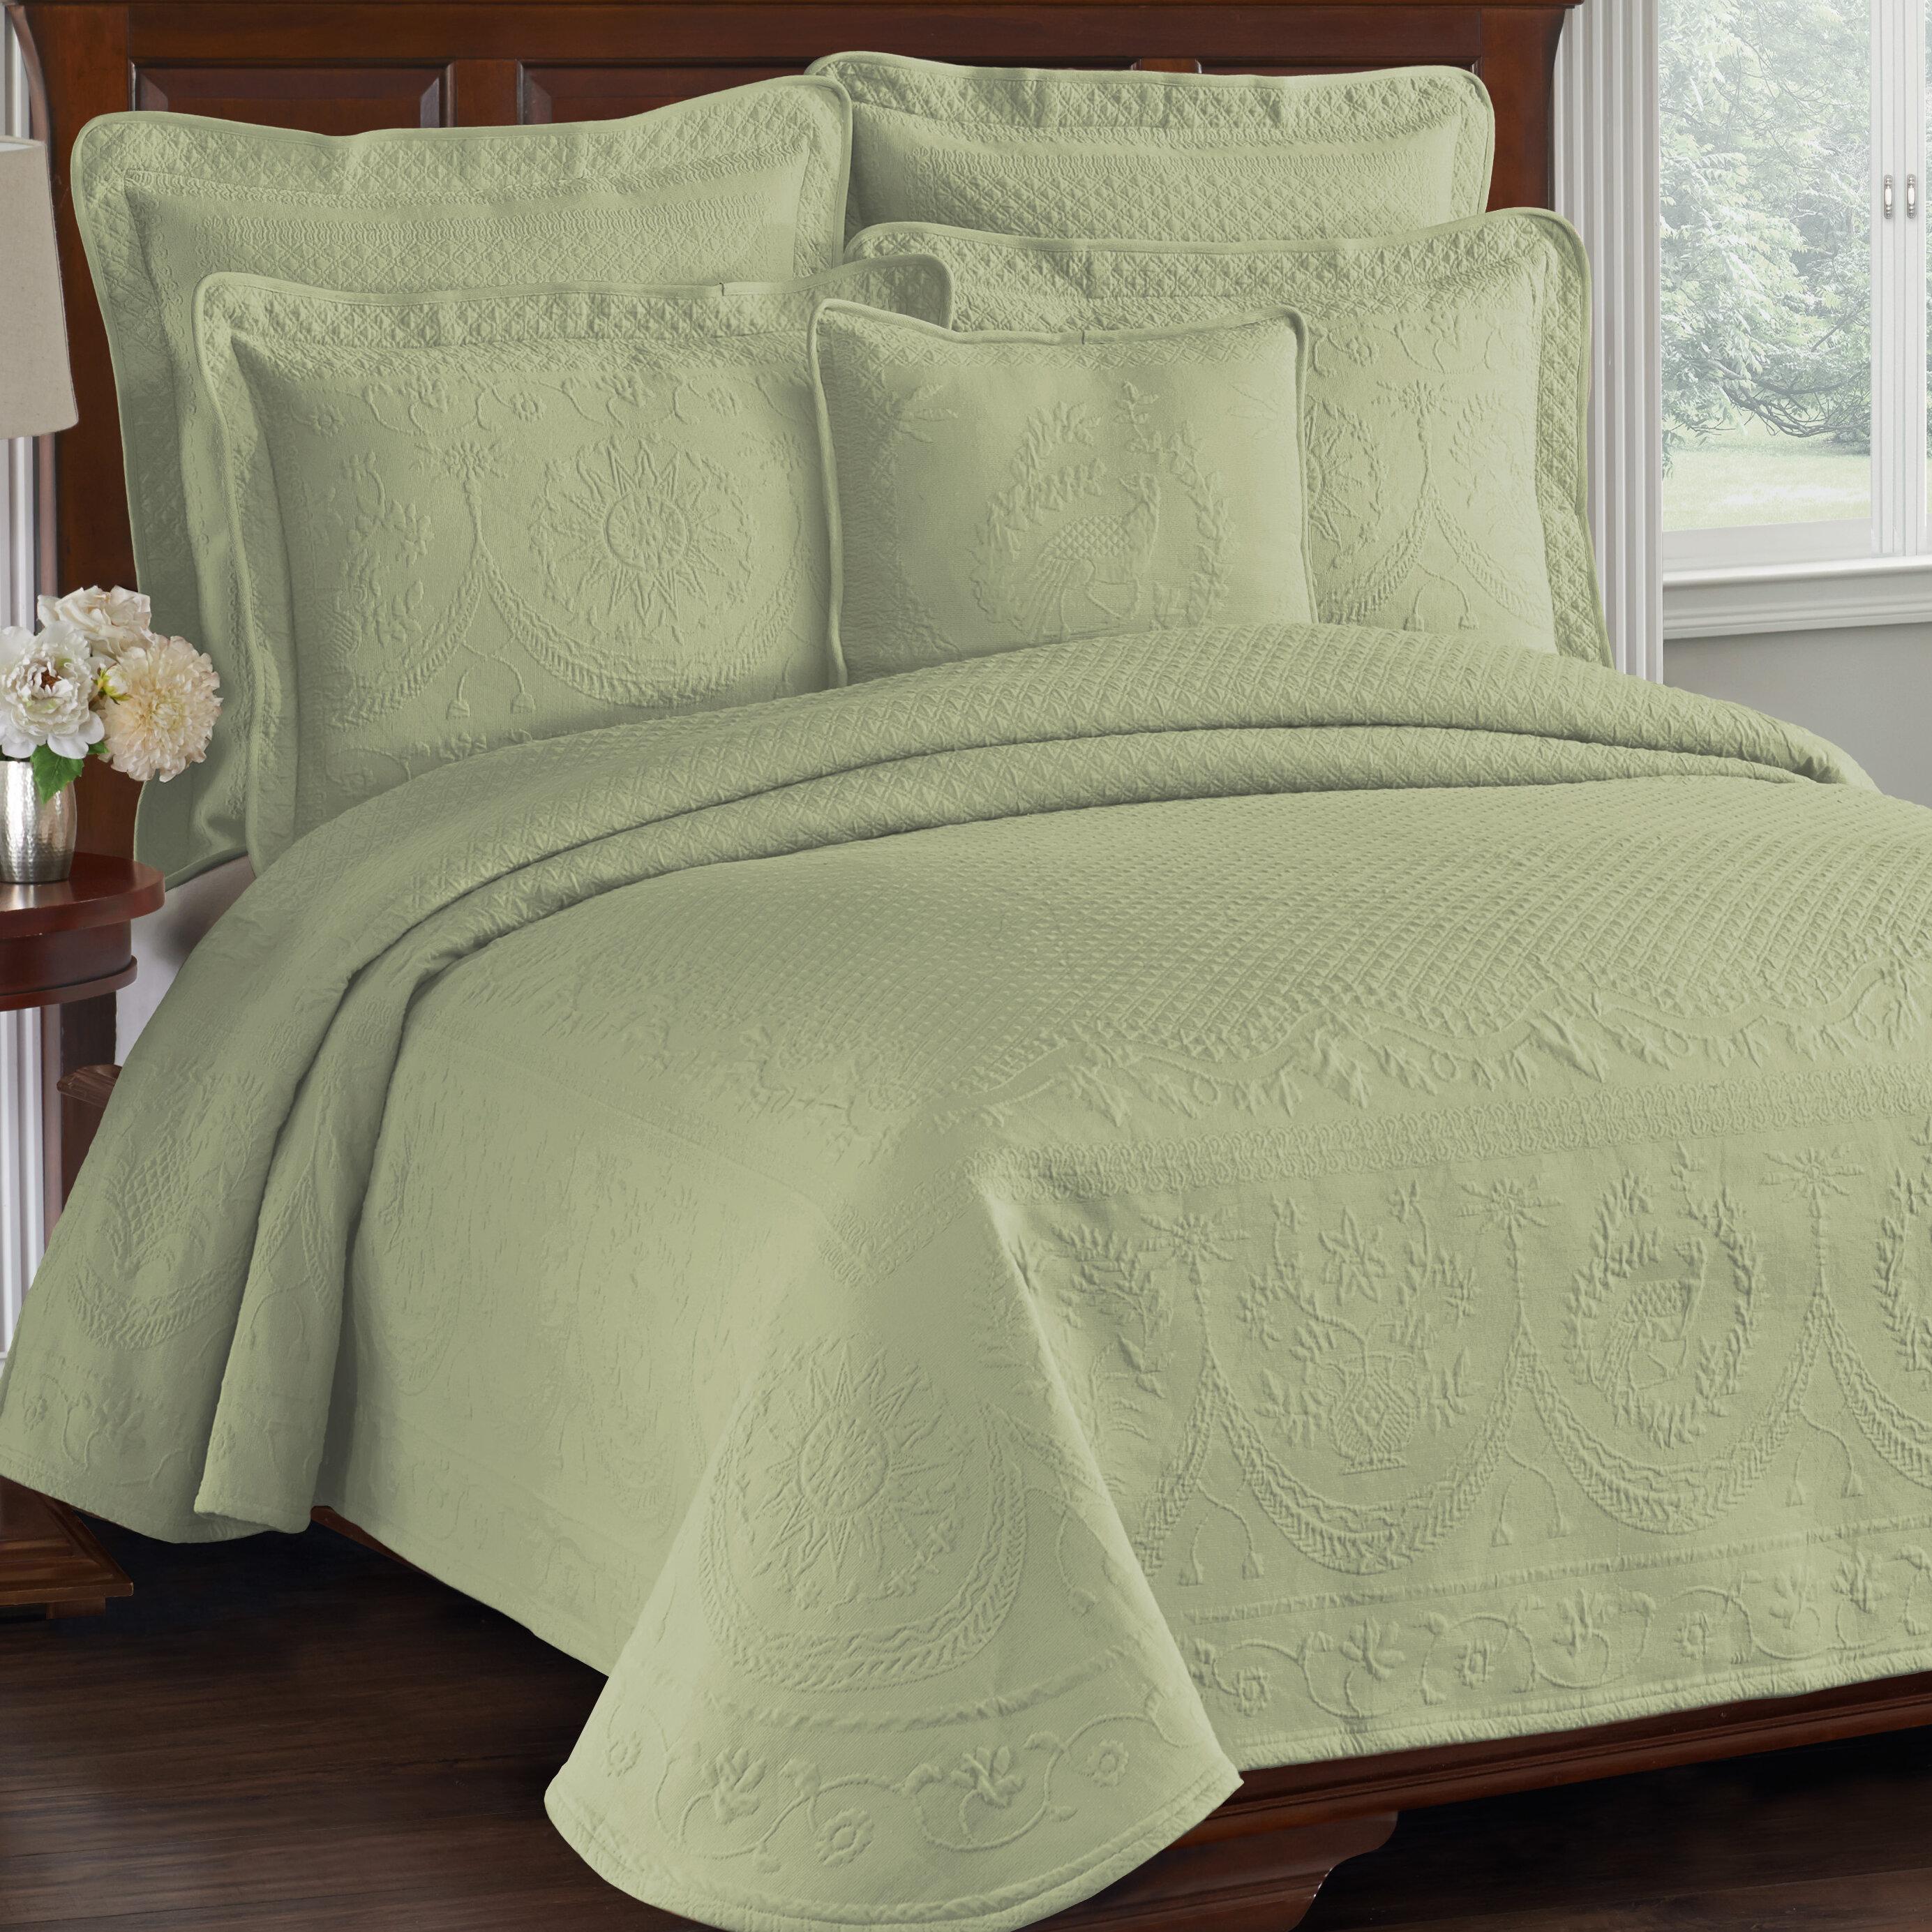 King Size Southwest Bedding Wayfair